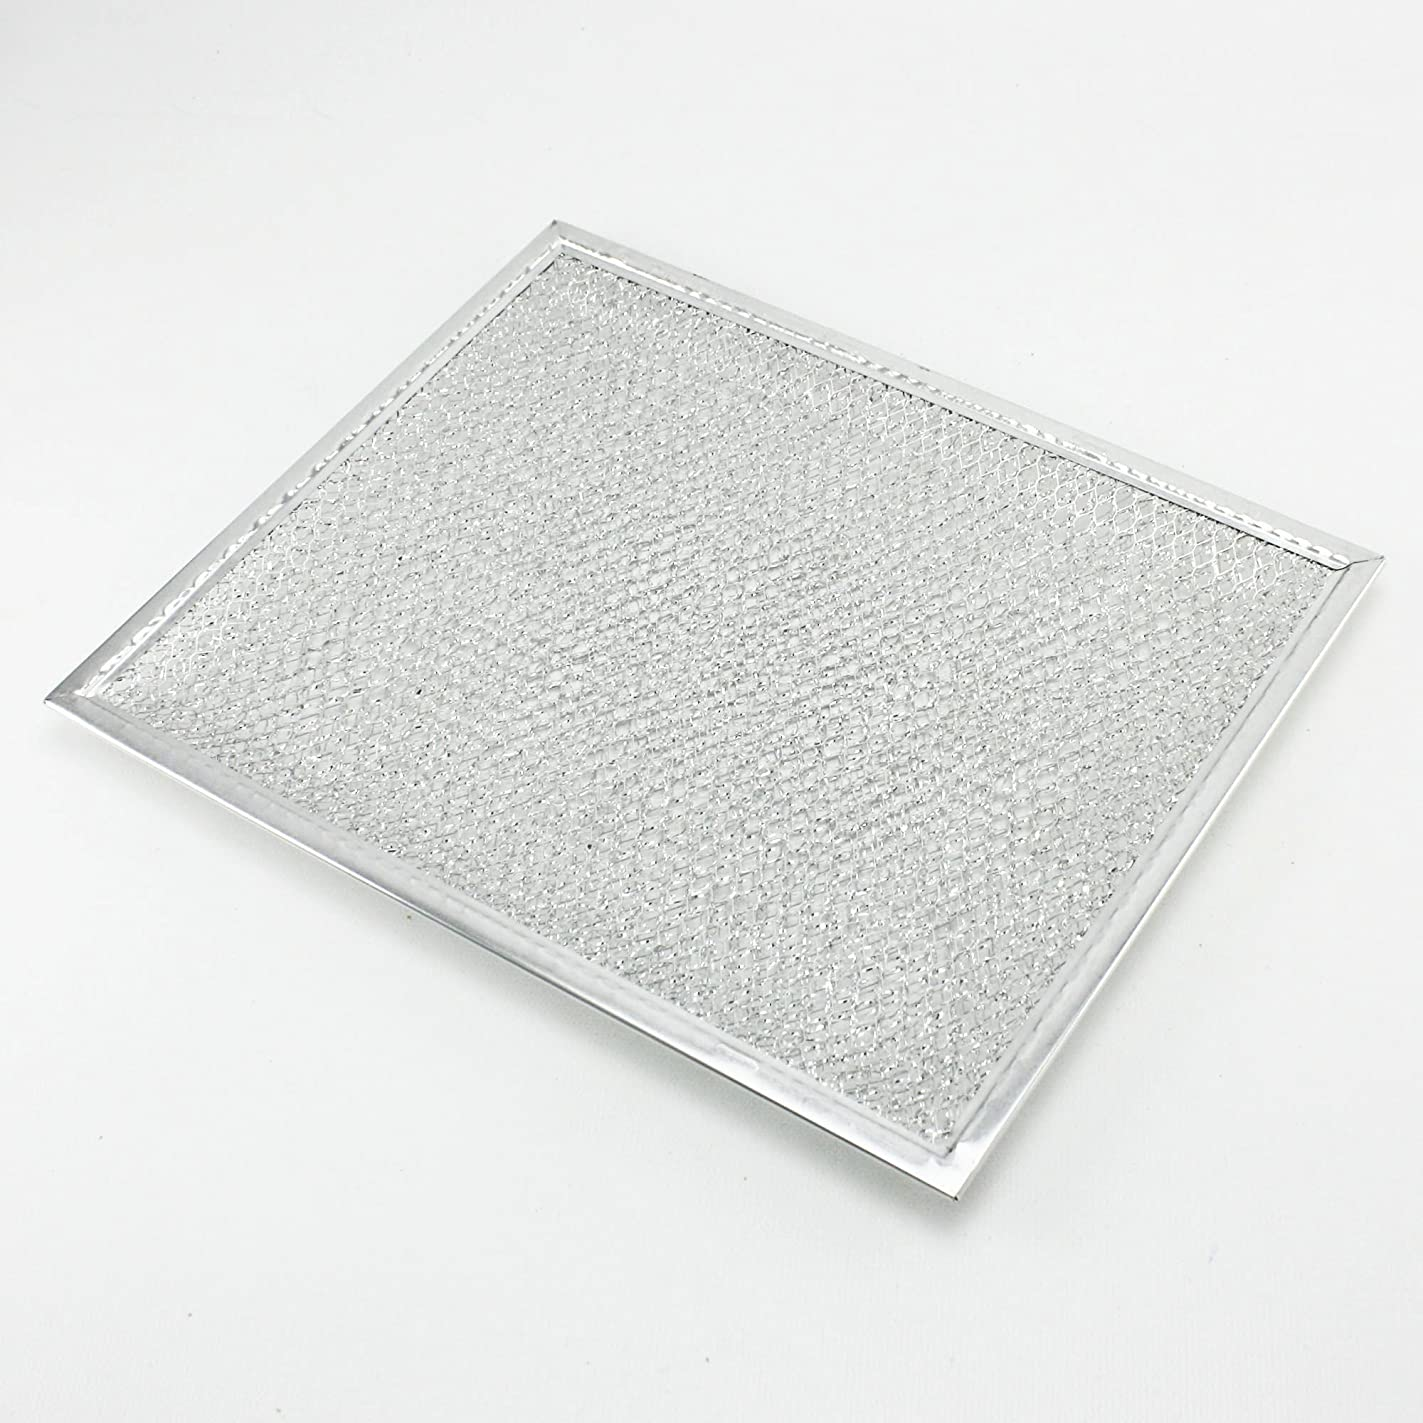 Nutone Aluminum Hood Vent Filter, 97006931